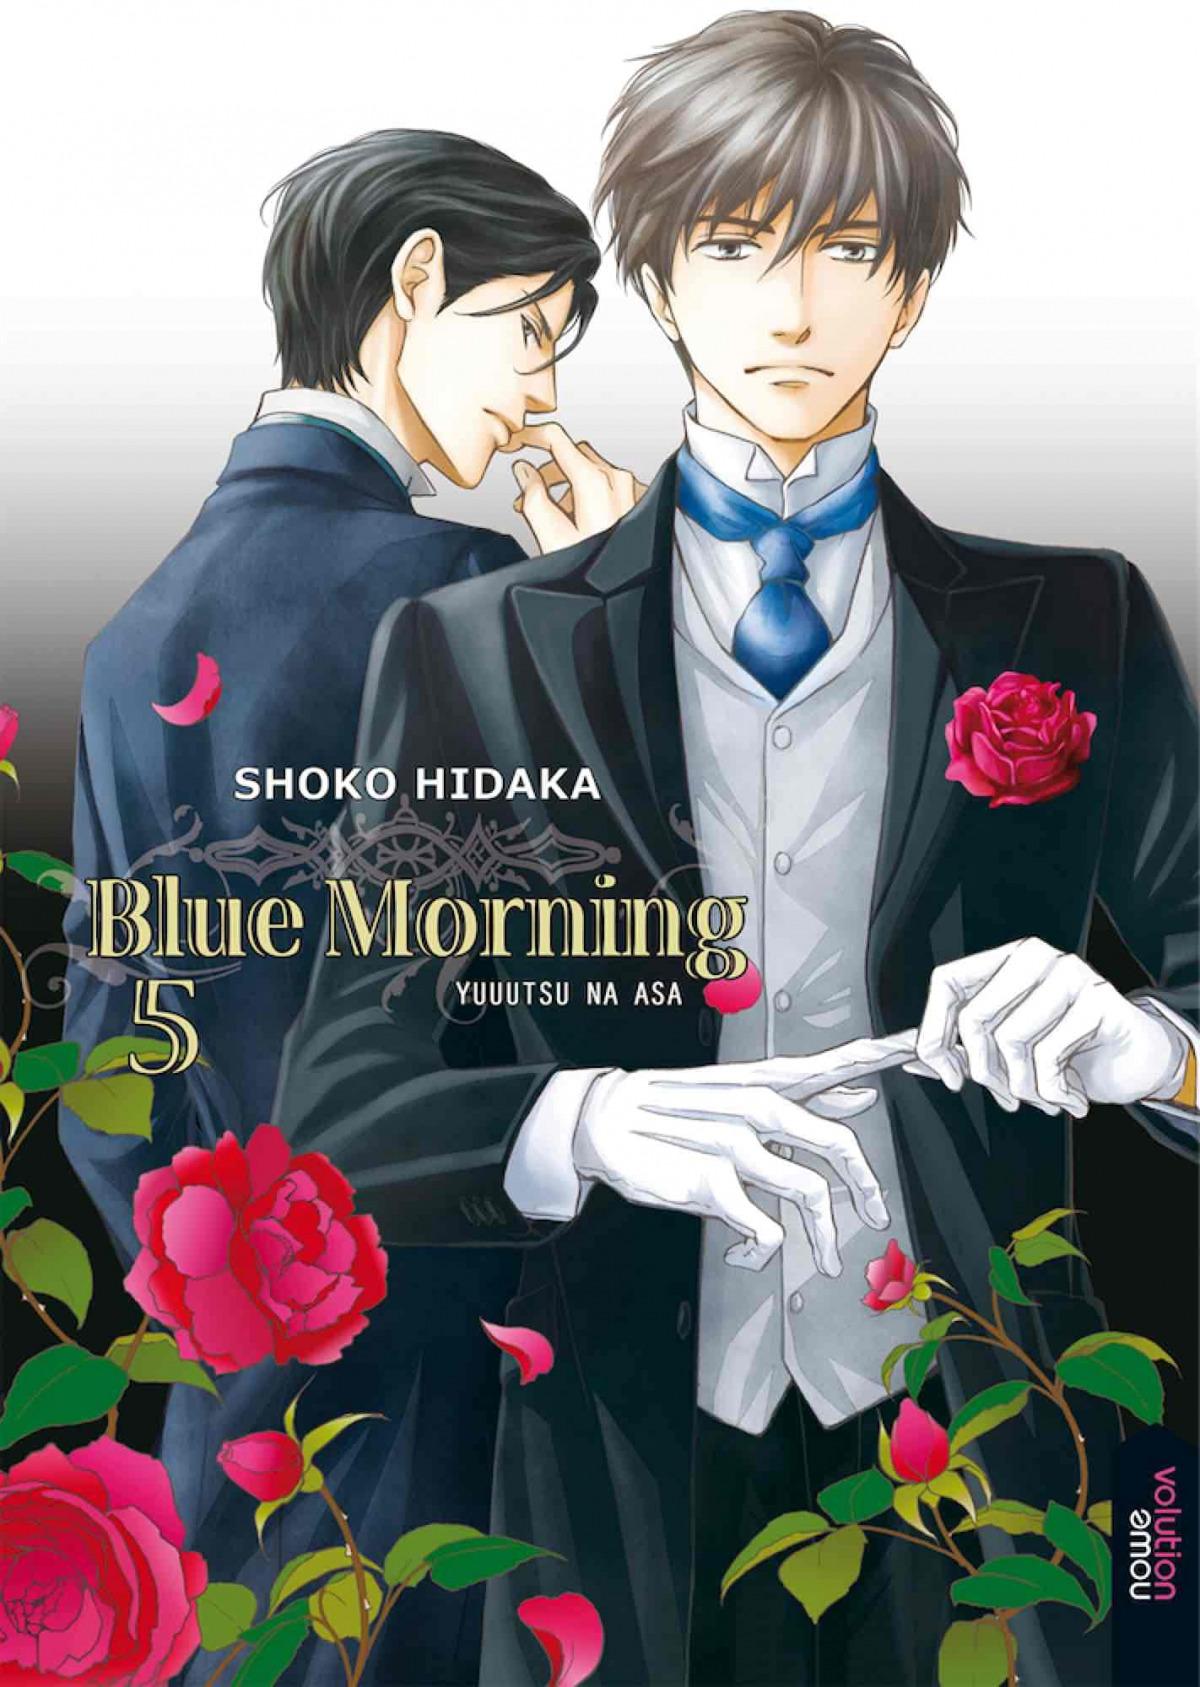 Blue morning 05